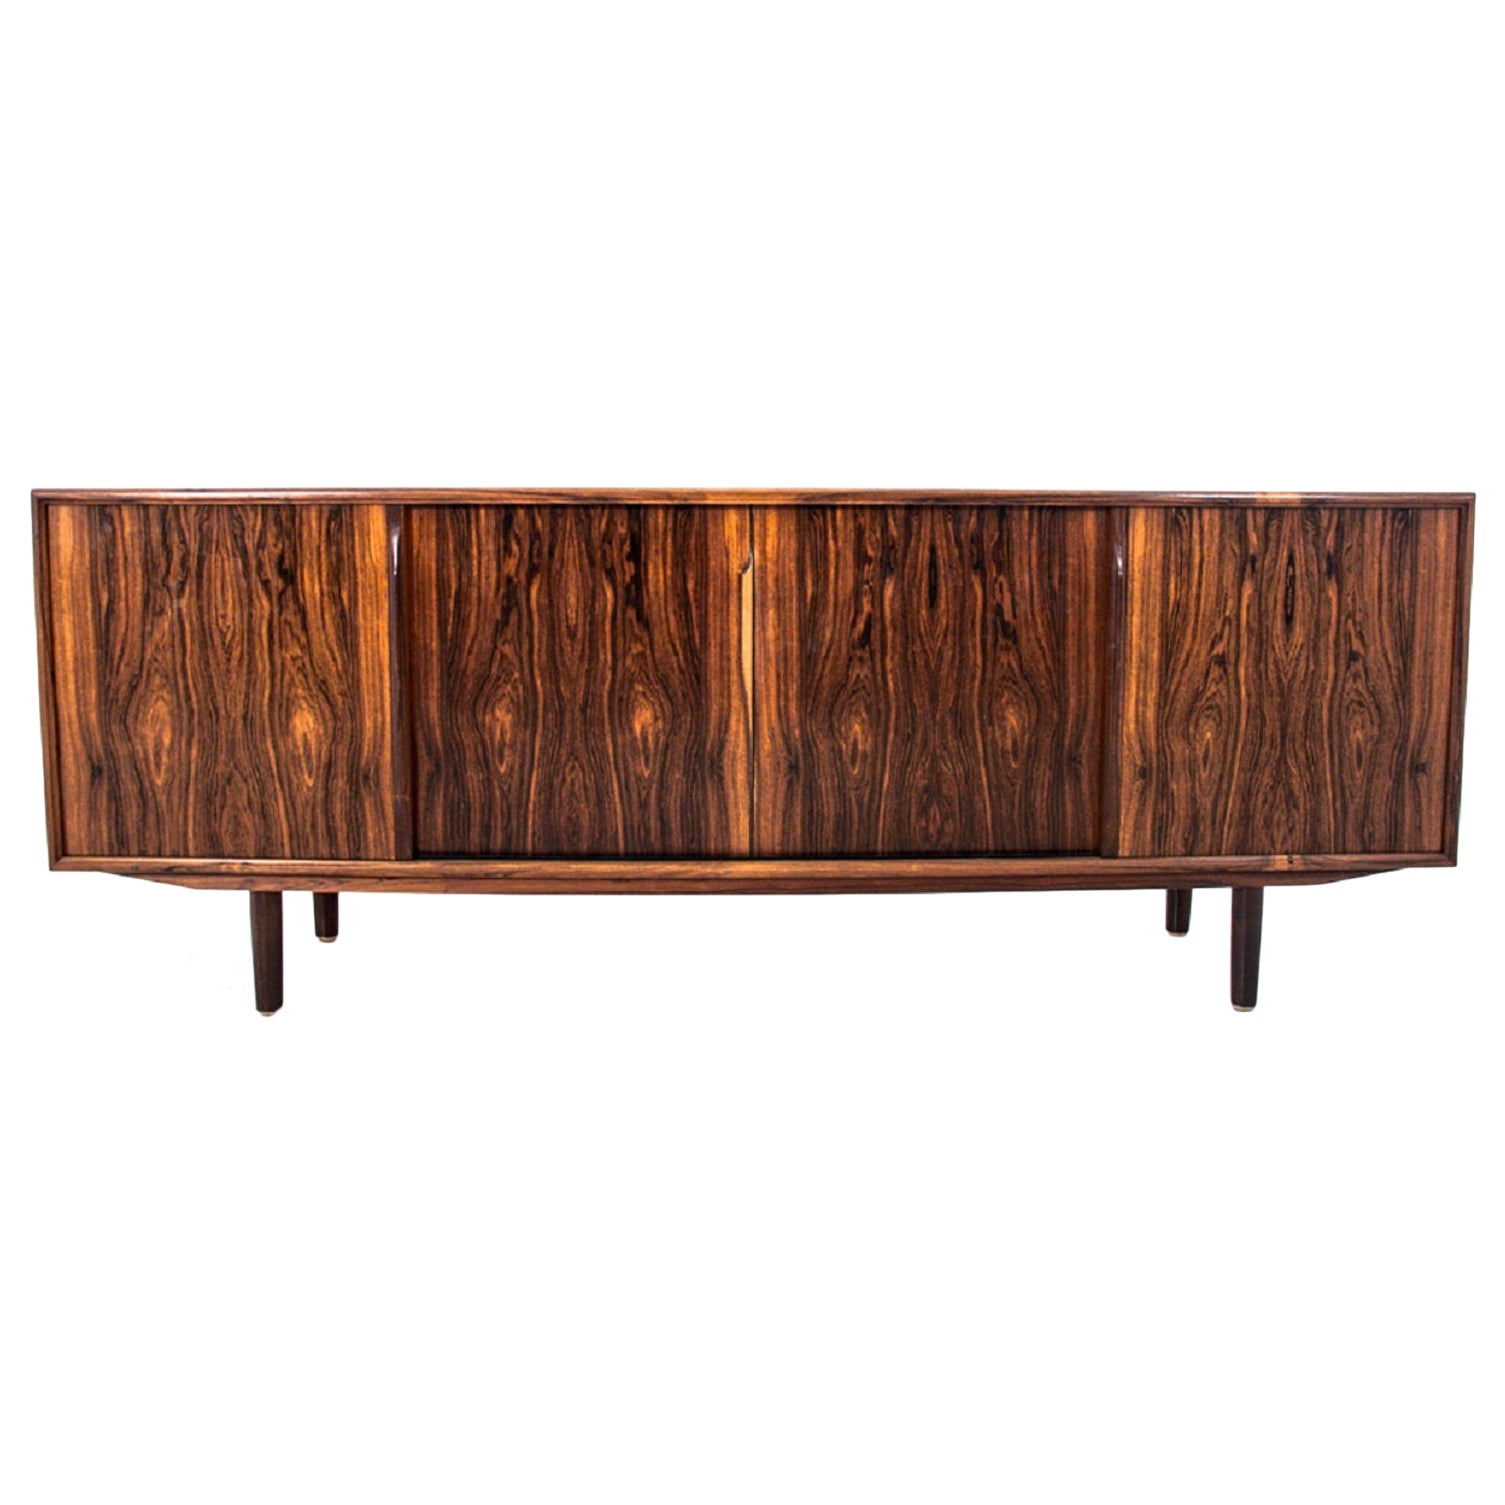 Rosewood Sideboard, Scandinavia, 1960s